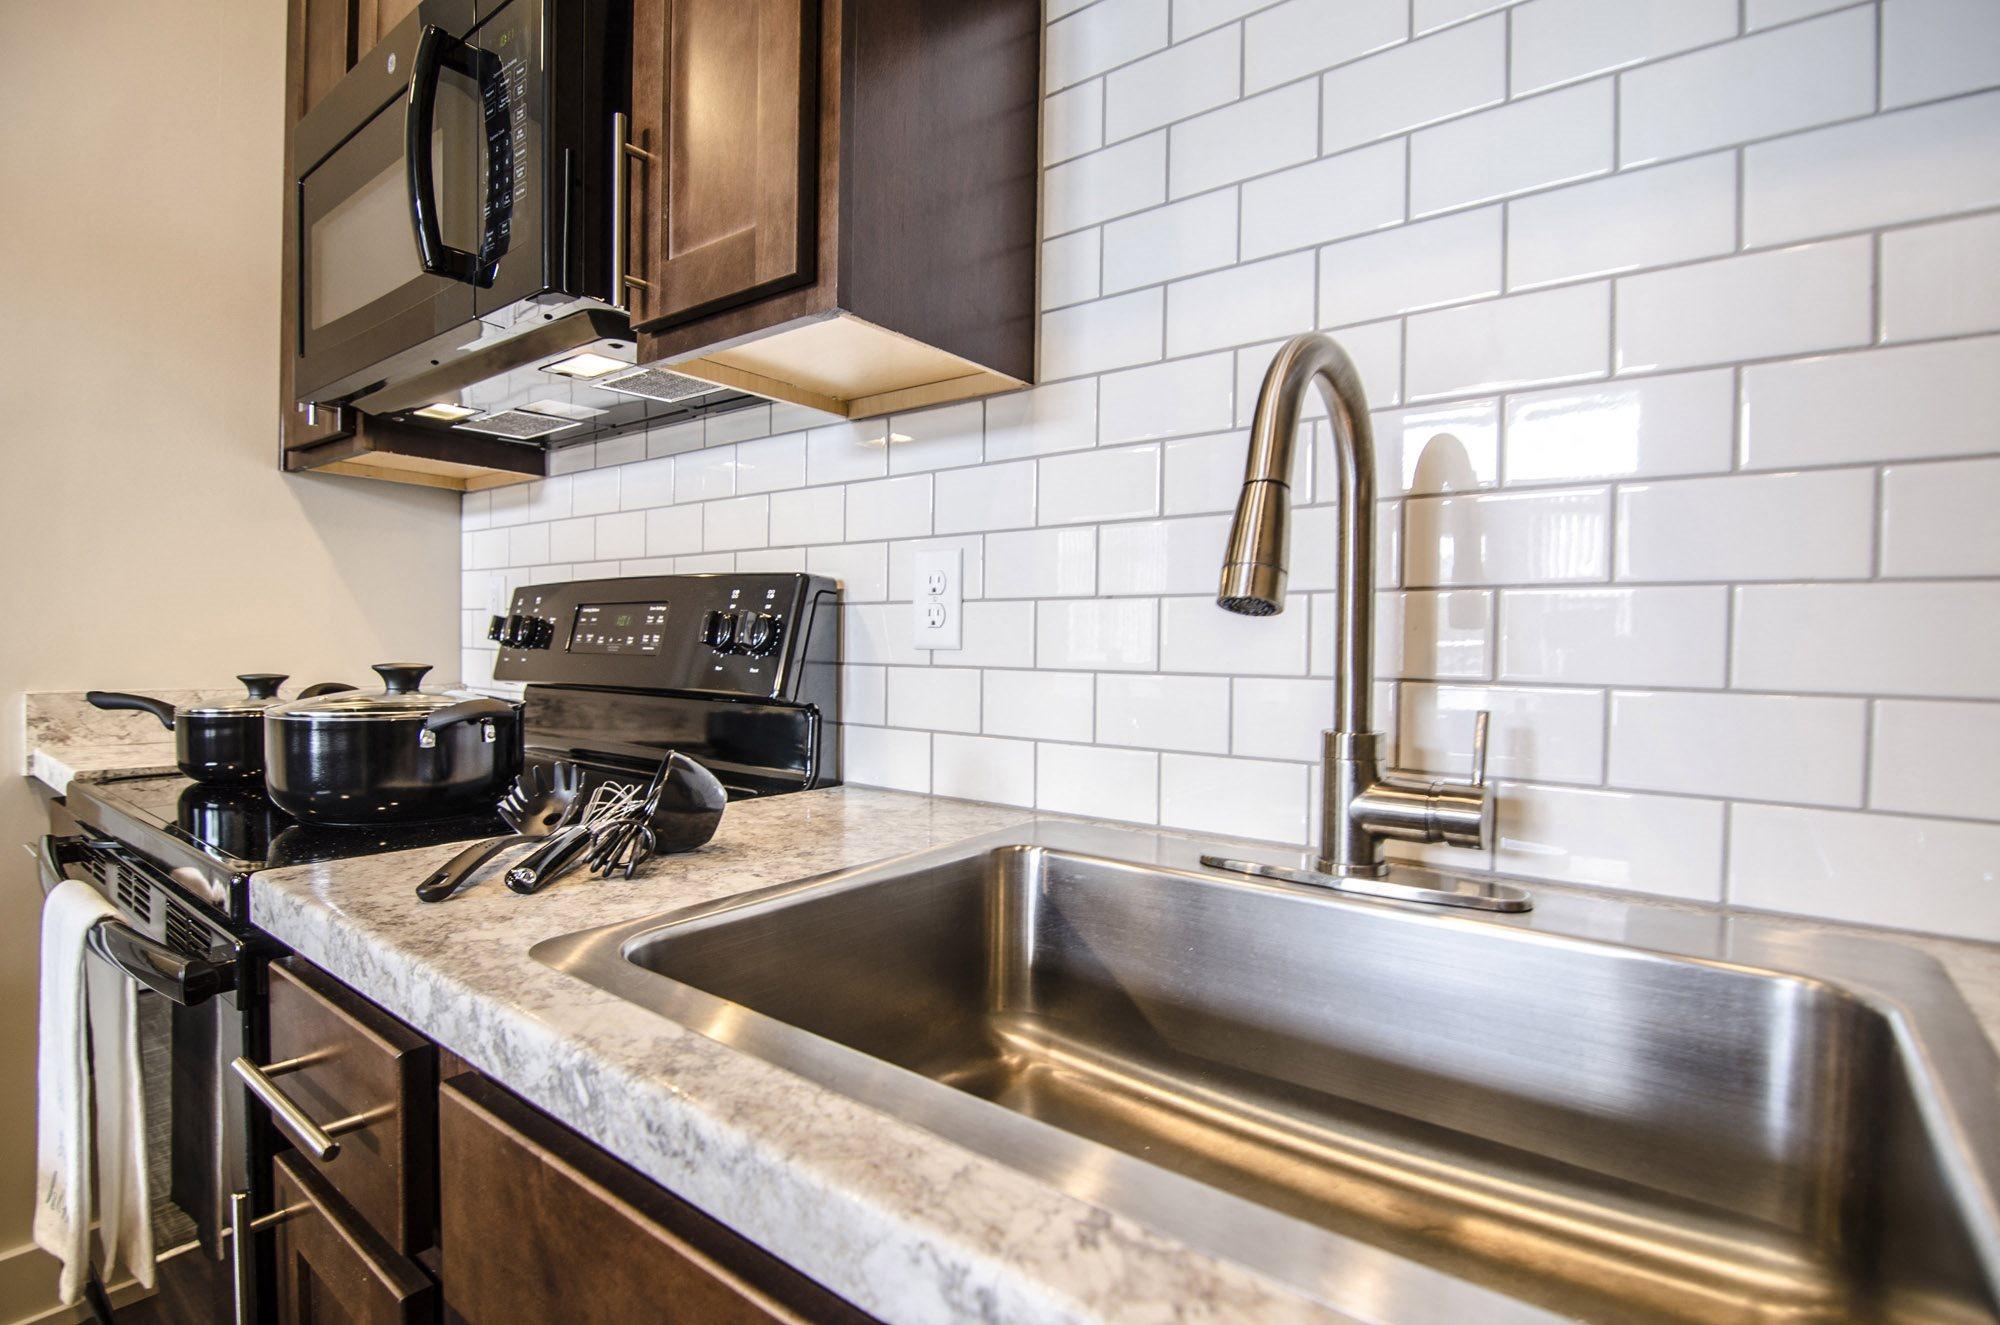 300 Grand  Apartments In East Lansing, Mi-8341